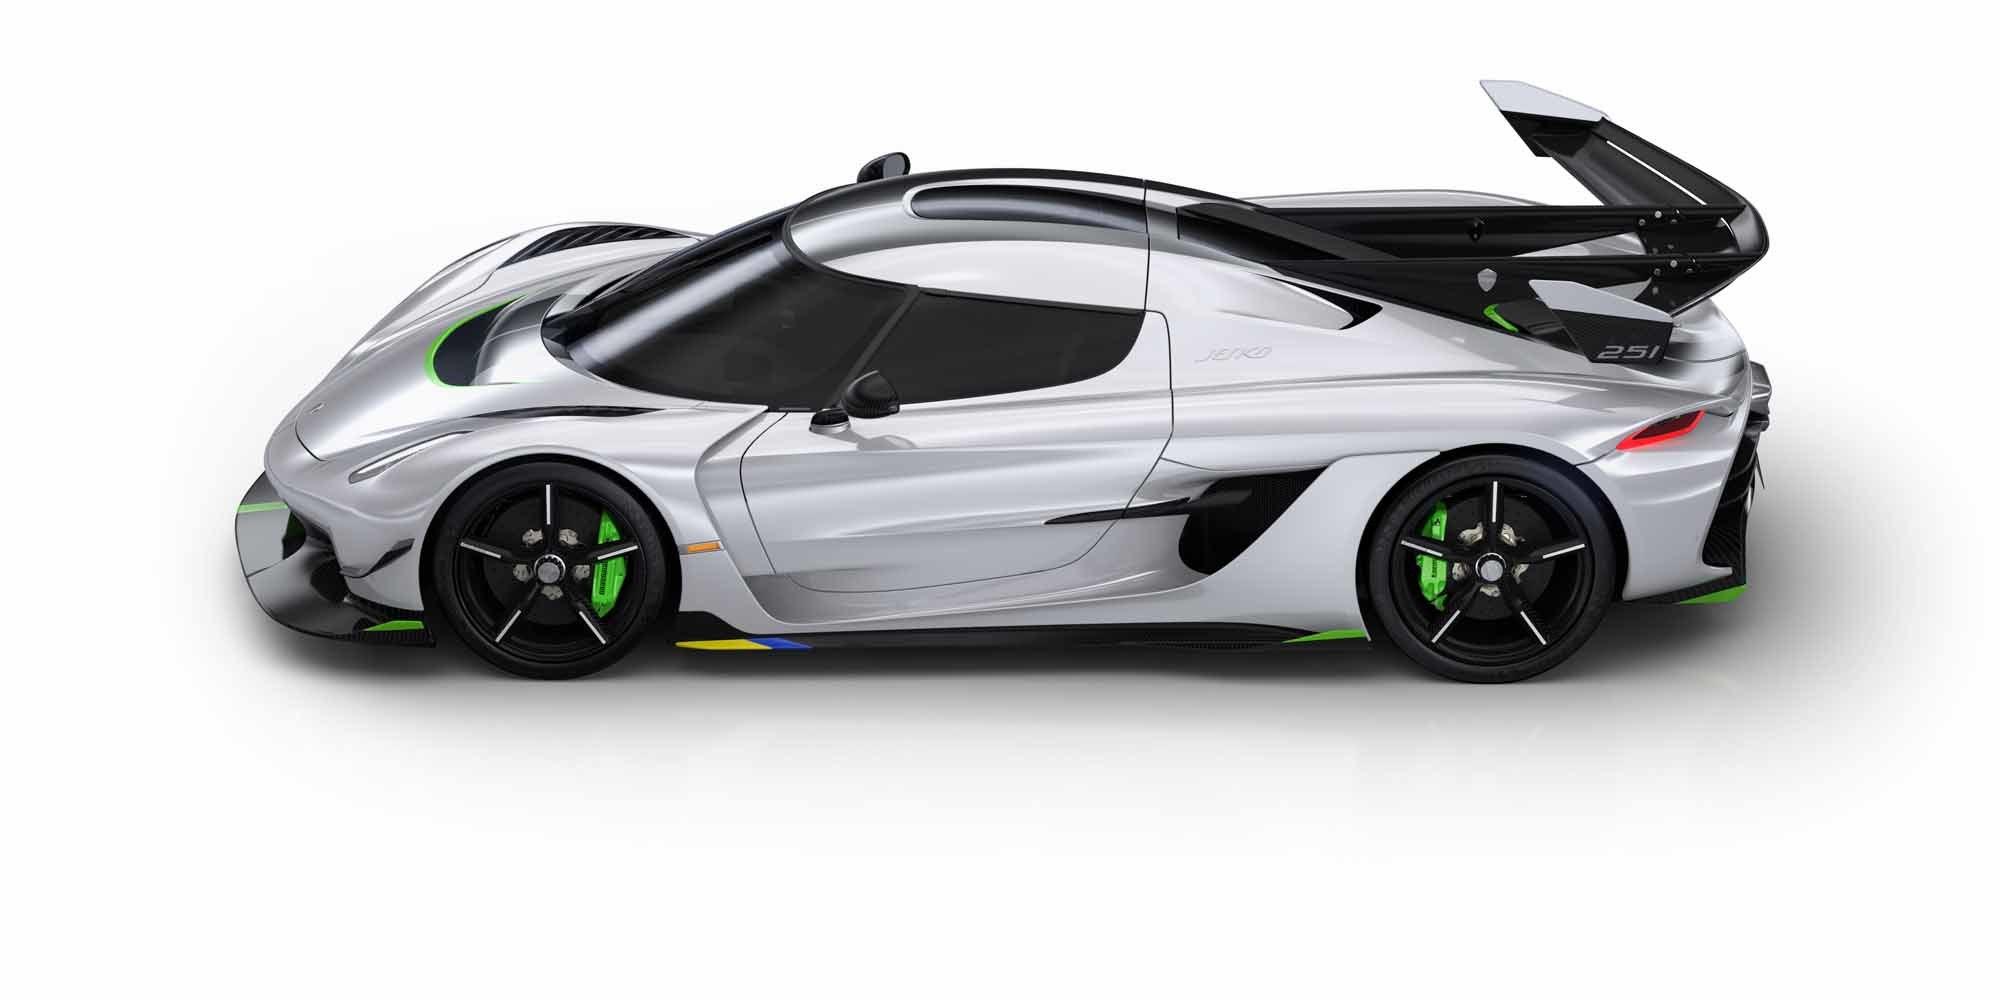 C:\Users\Jialing\Desktop\20190403\20190403\639-Car Guide\Koenigsegg Jesko - half\5c80b363ec05c47562000097.jpg